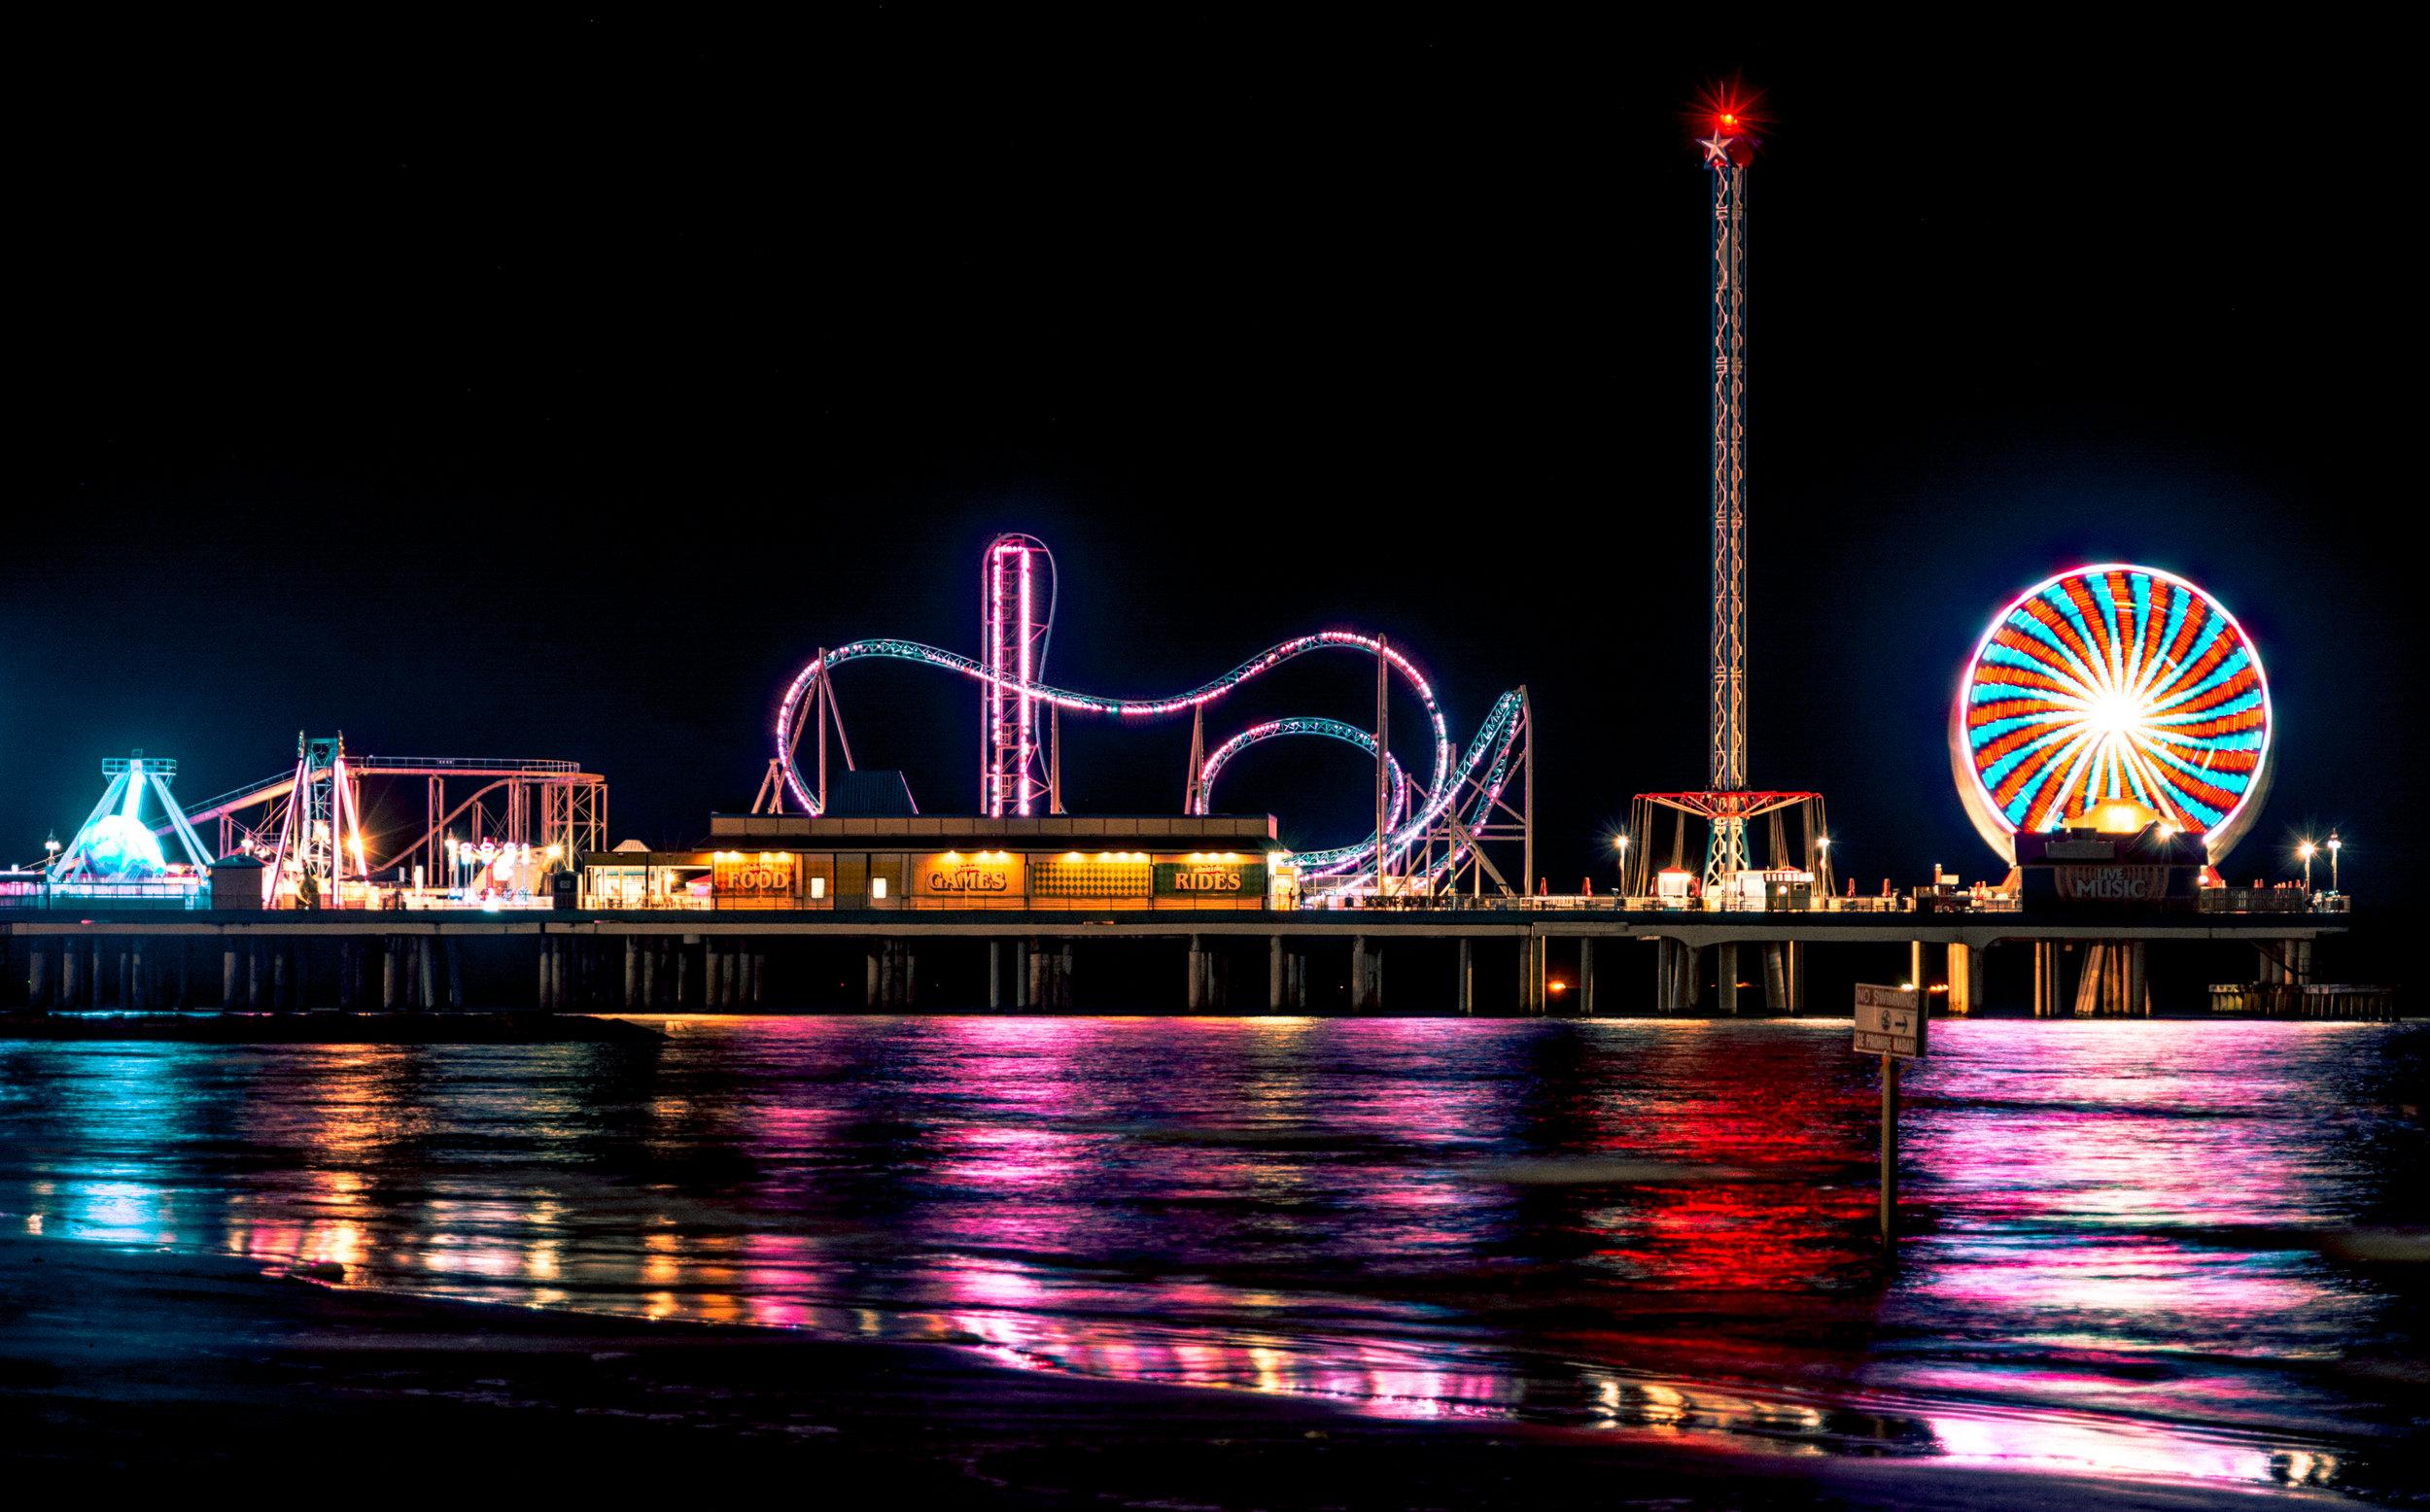 Photo Title: Pleasure Pier at Night